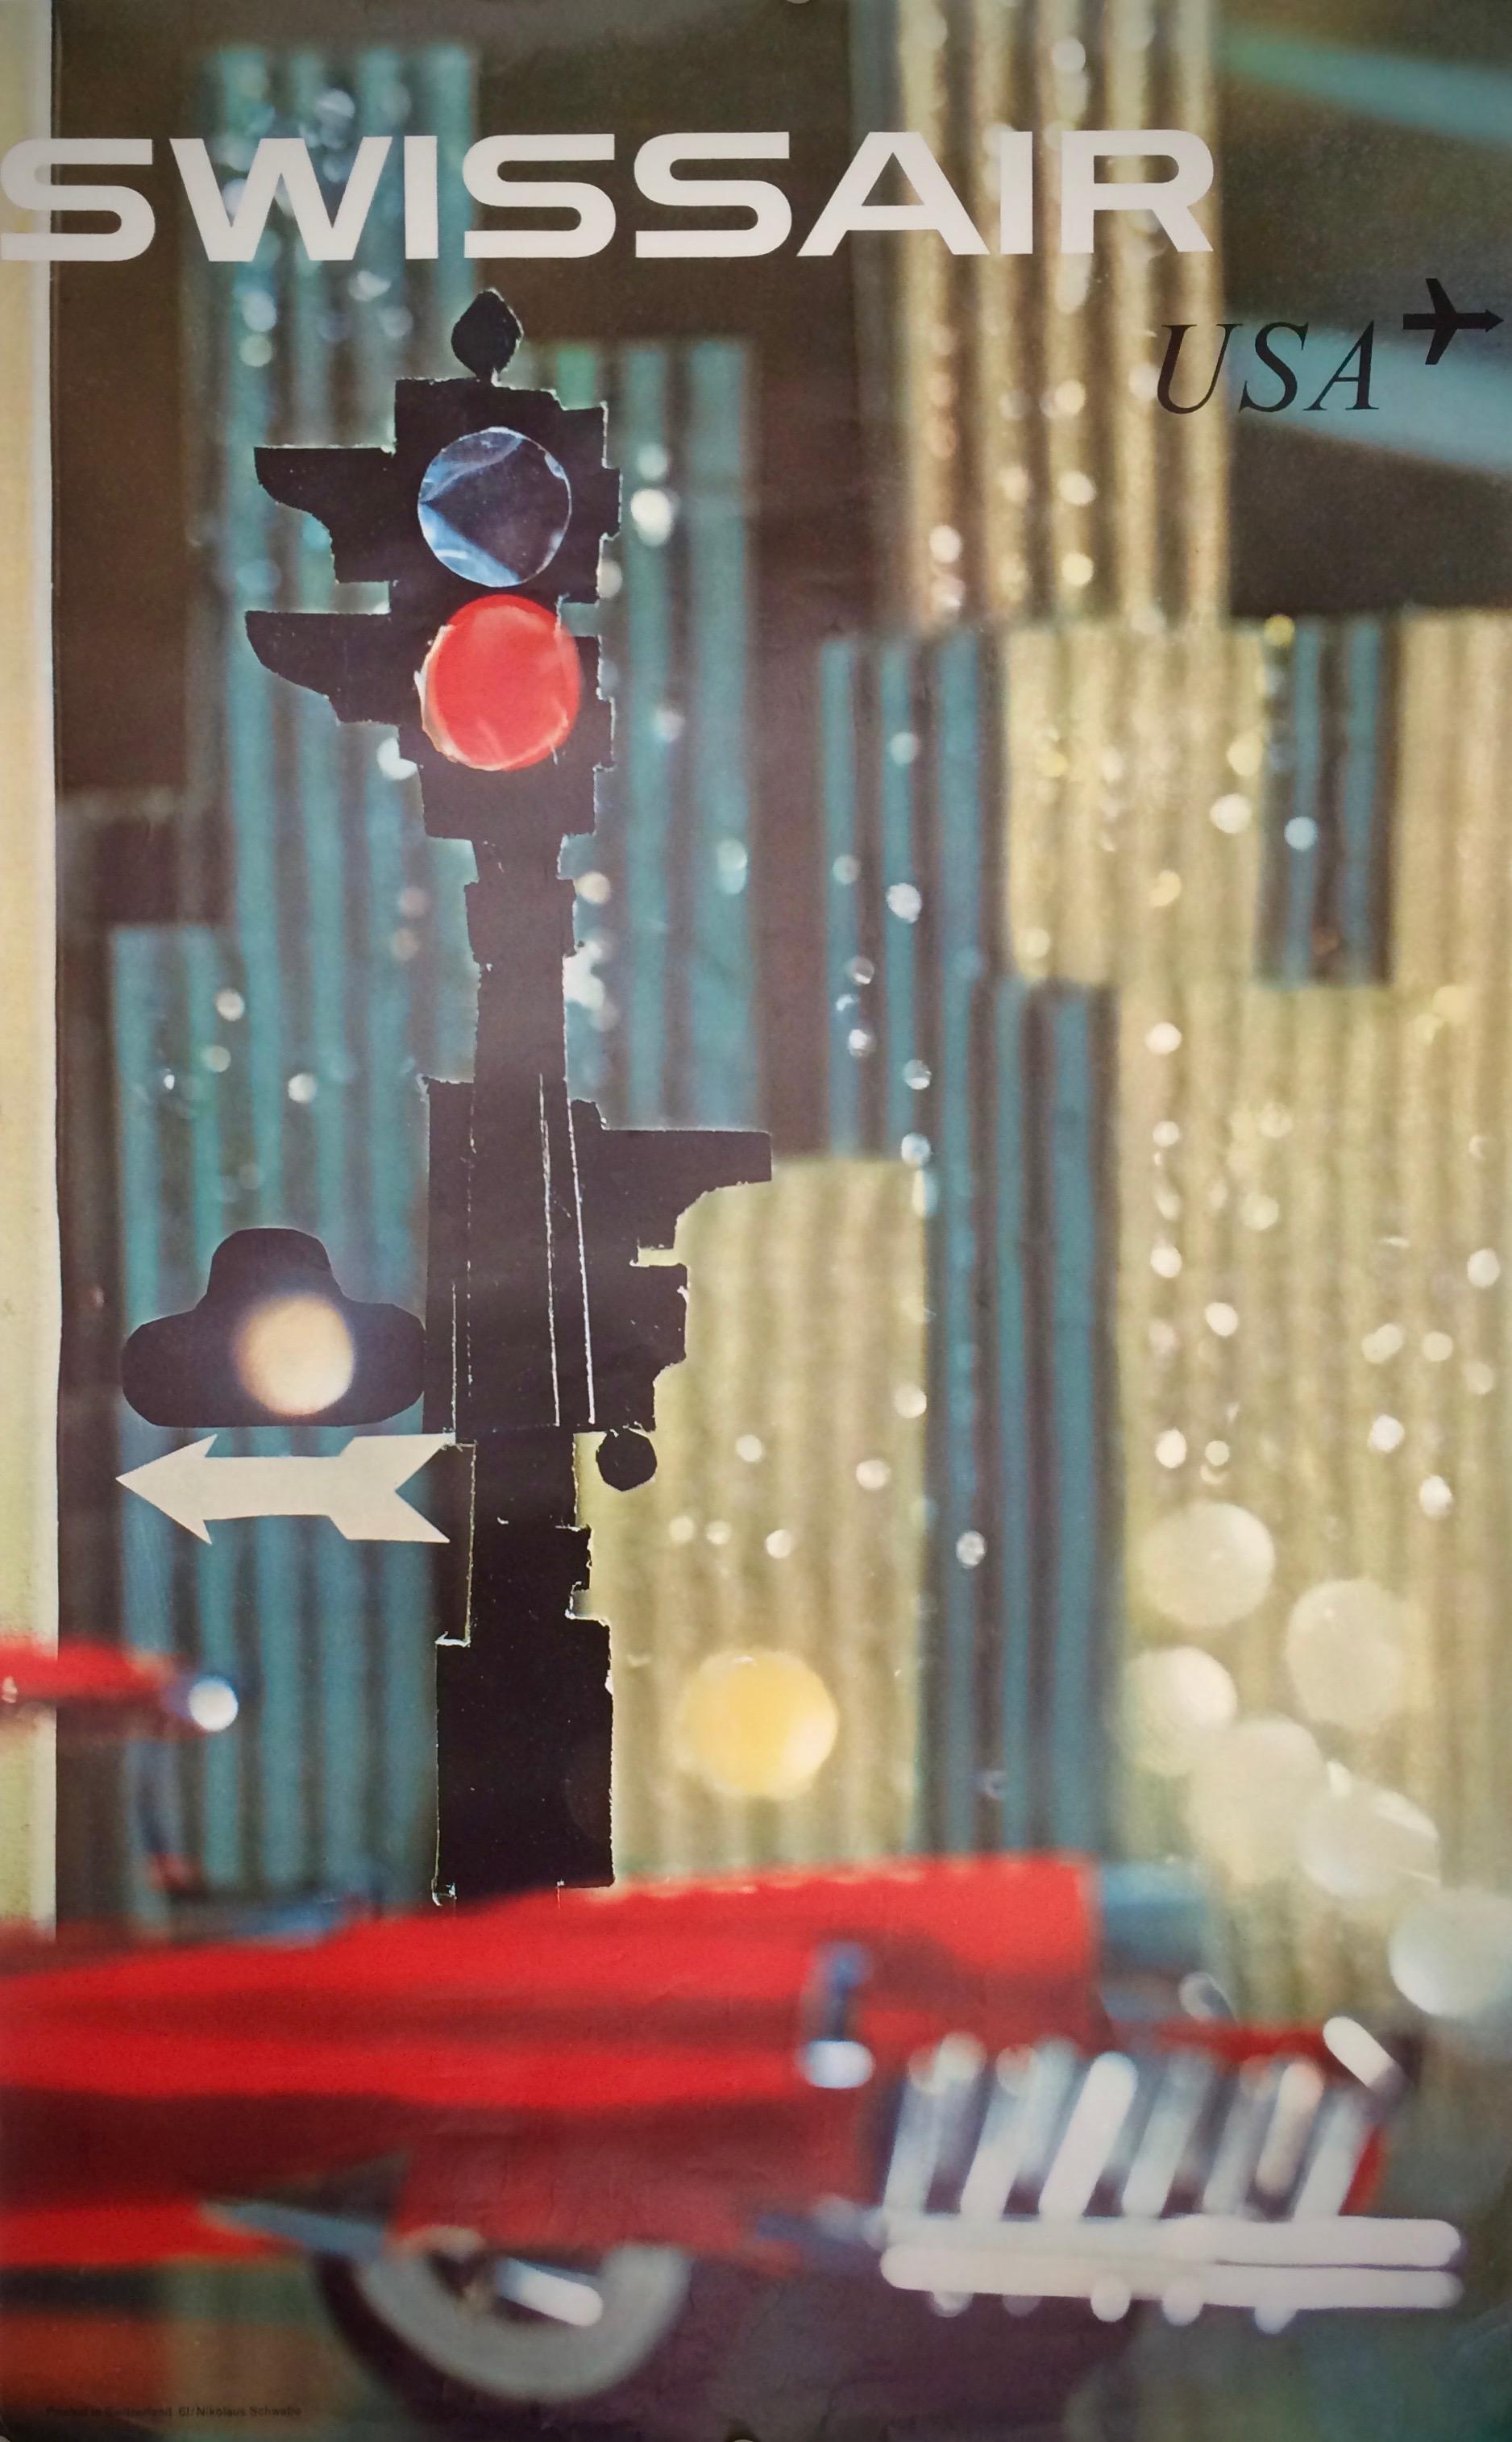 Street scene modernist design traffic lights skyscrapers